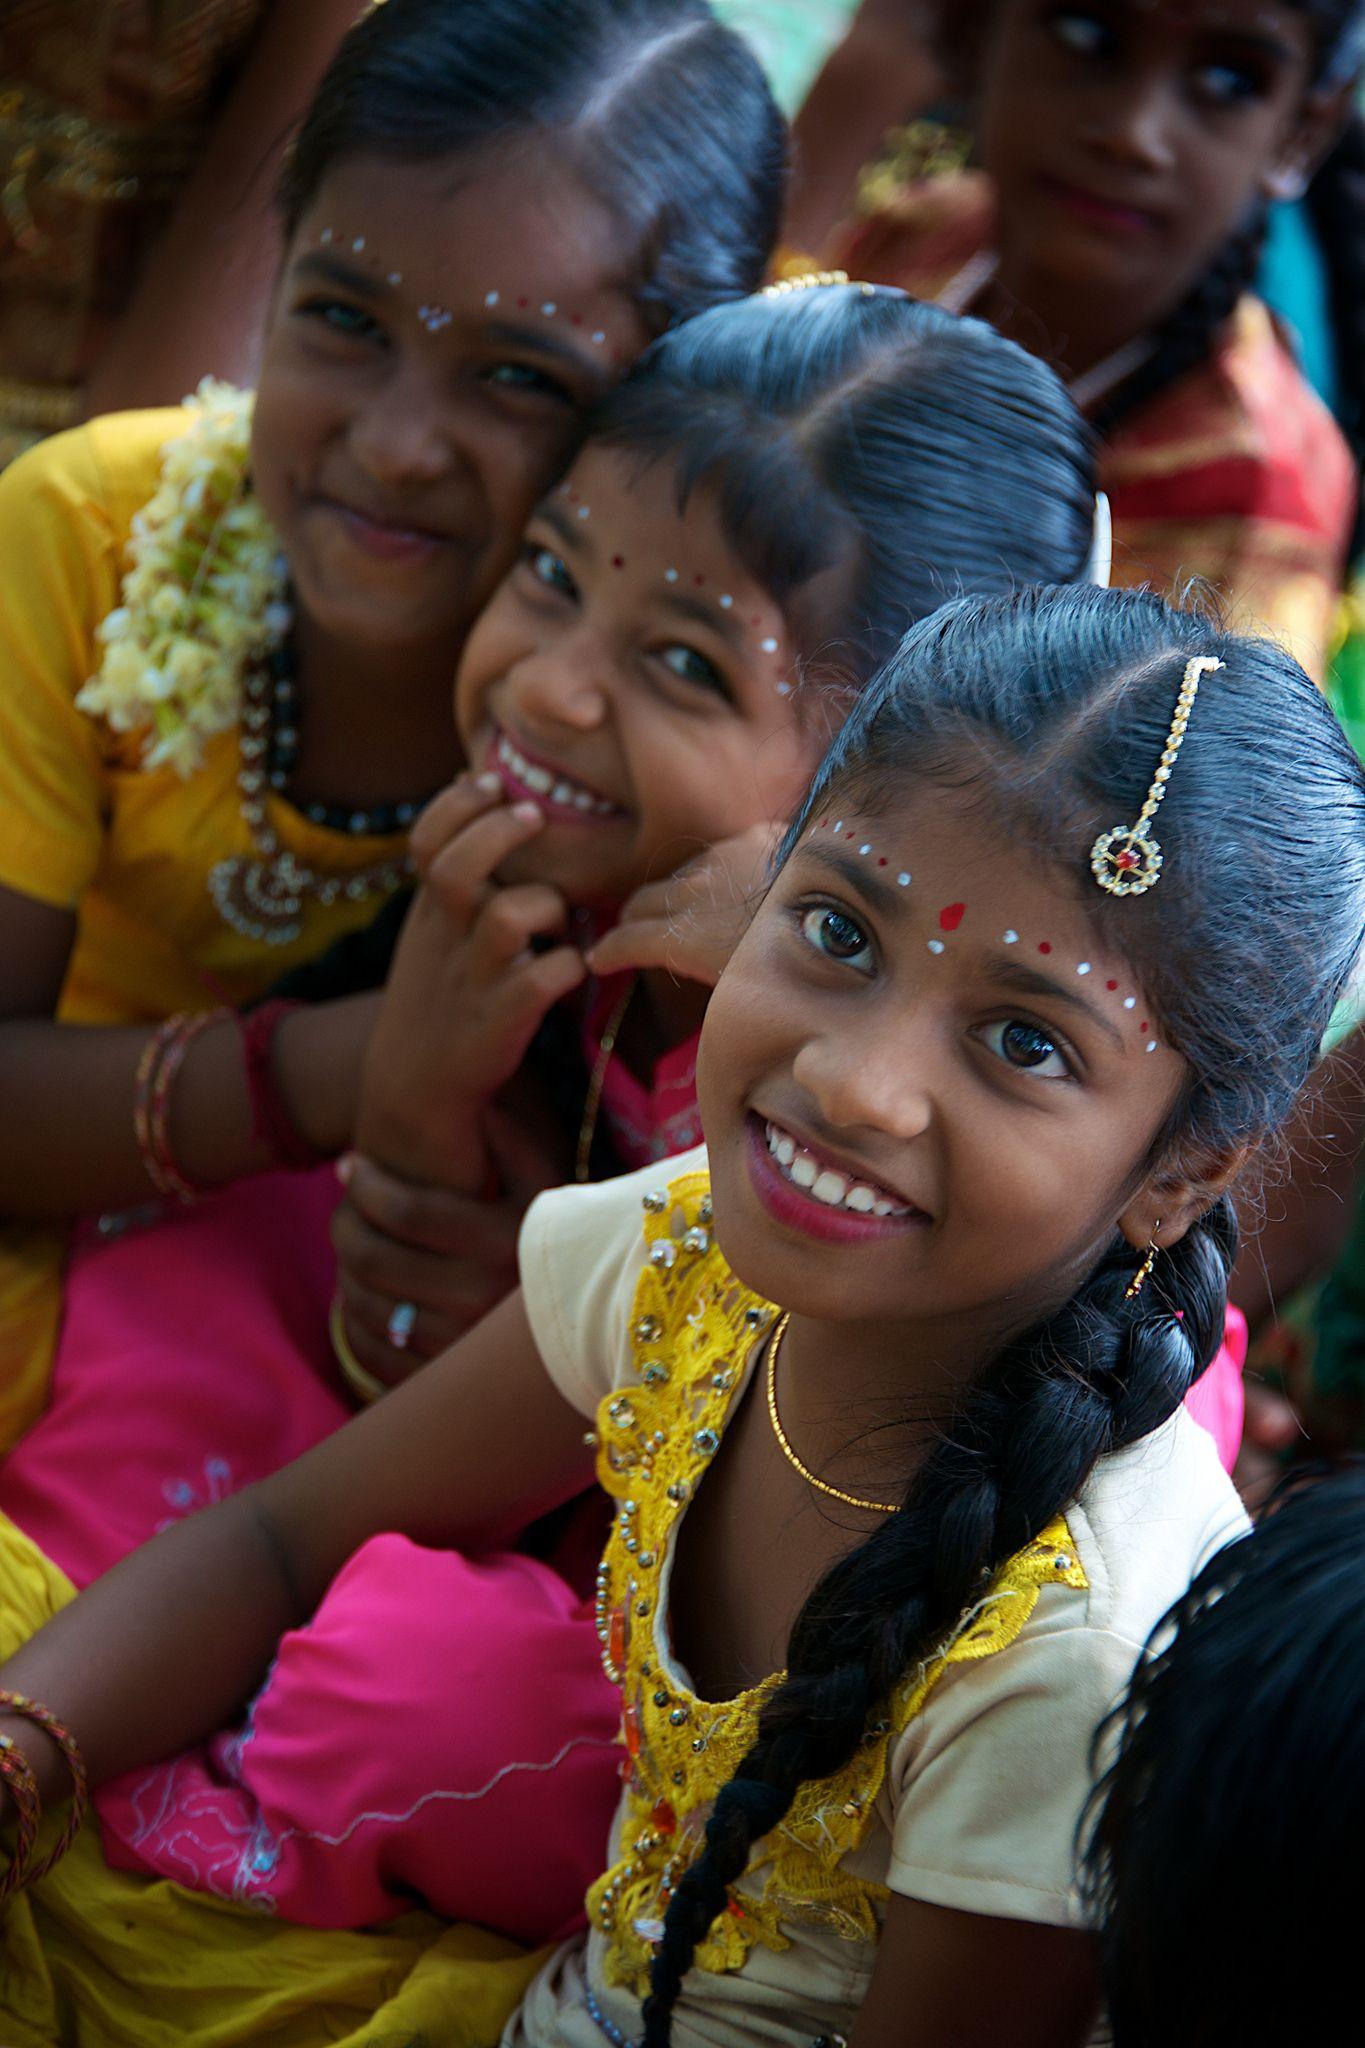 Indian Smiles Beauty, Beautiful children, Beauty around